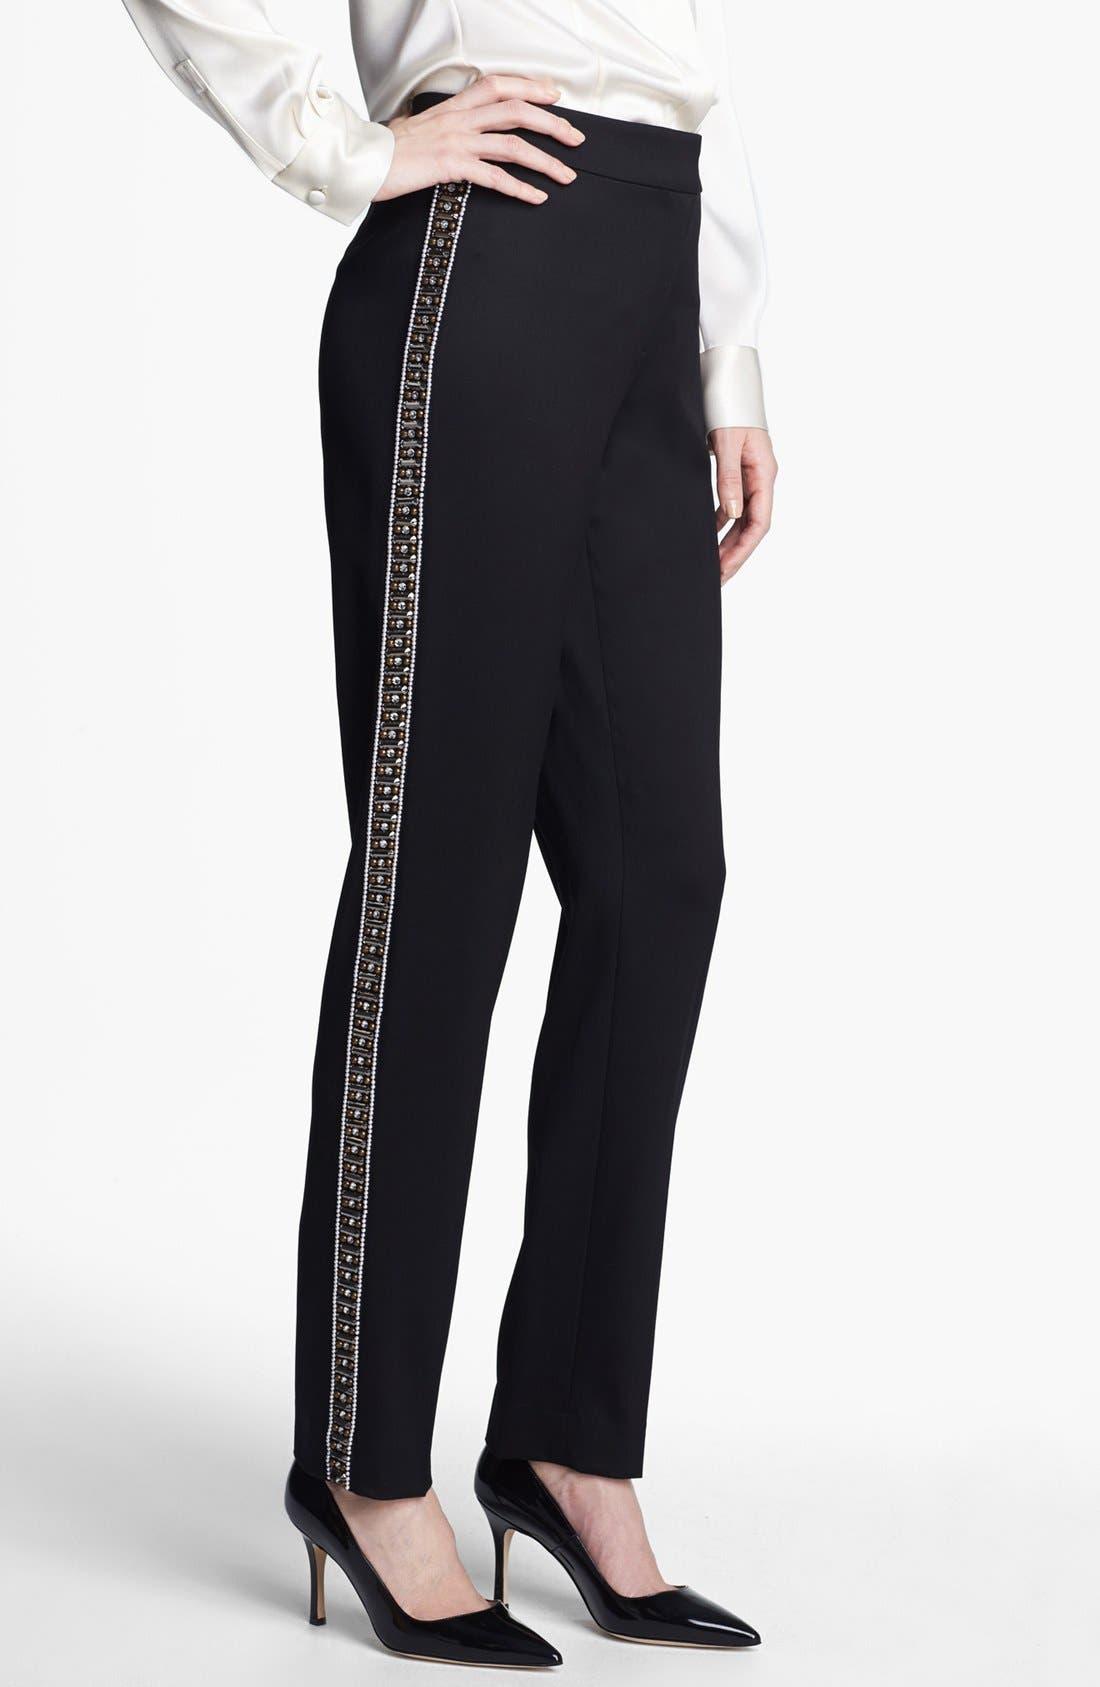 Main Image - St. John Collection 'Emma' Embellished Venetian Wool Pants